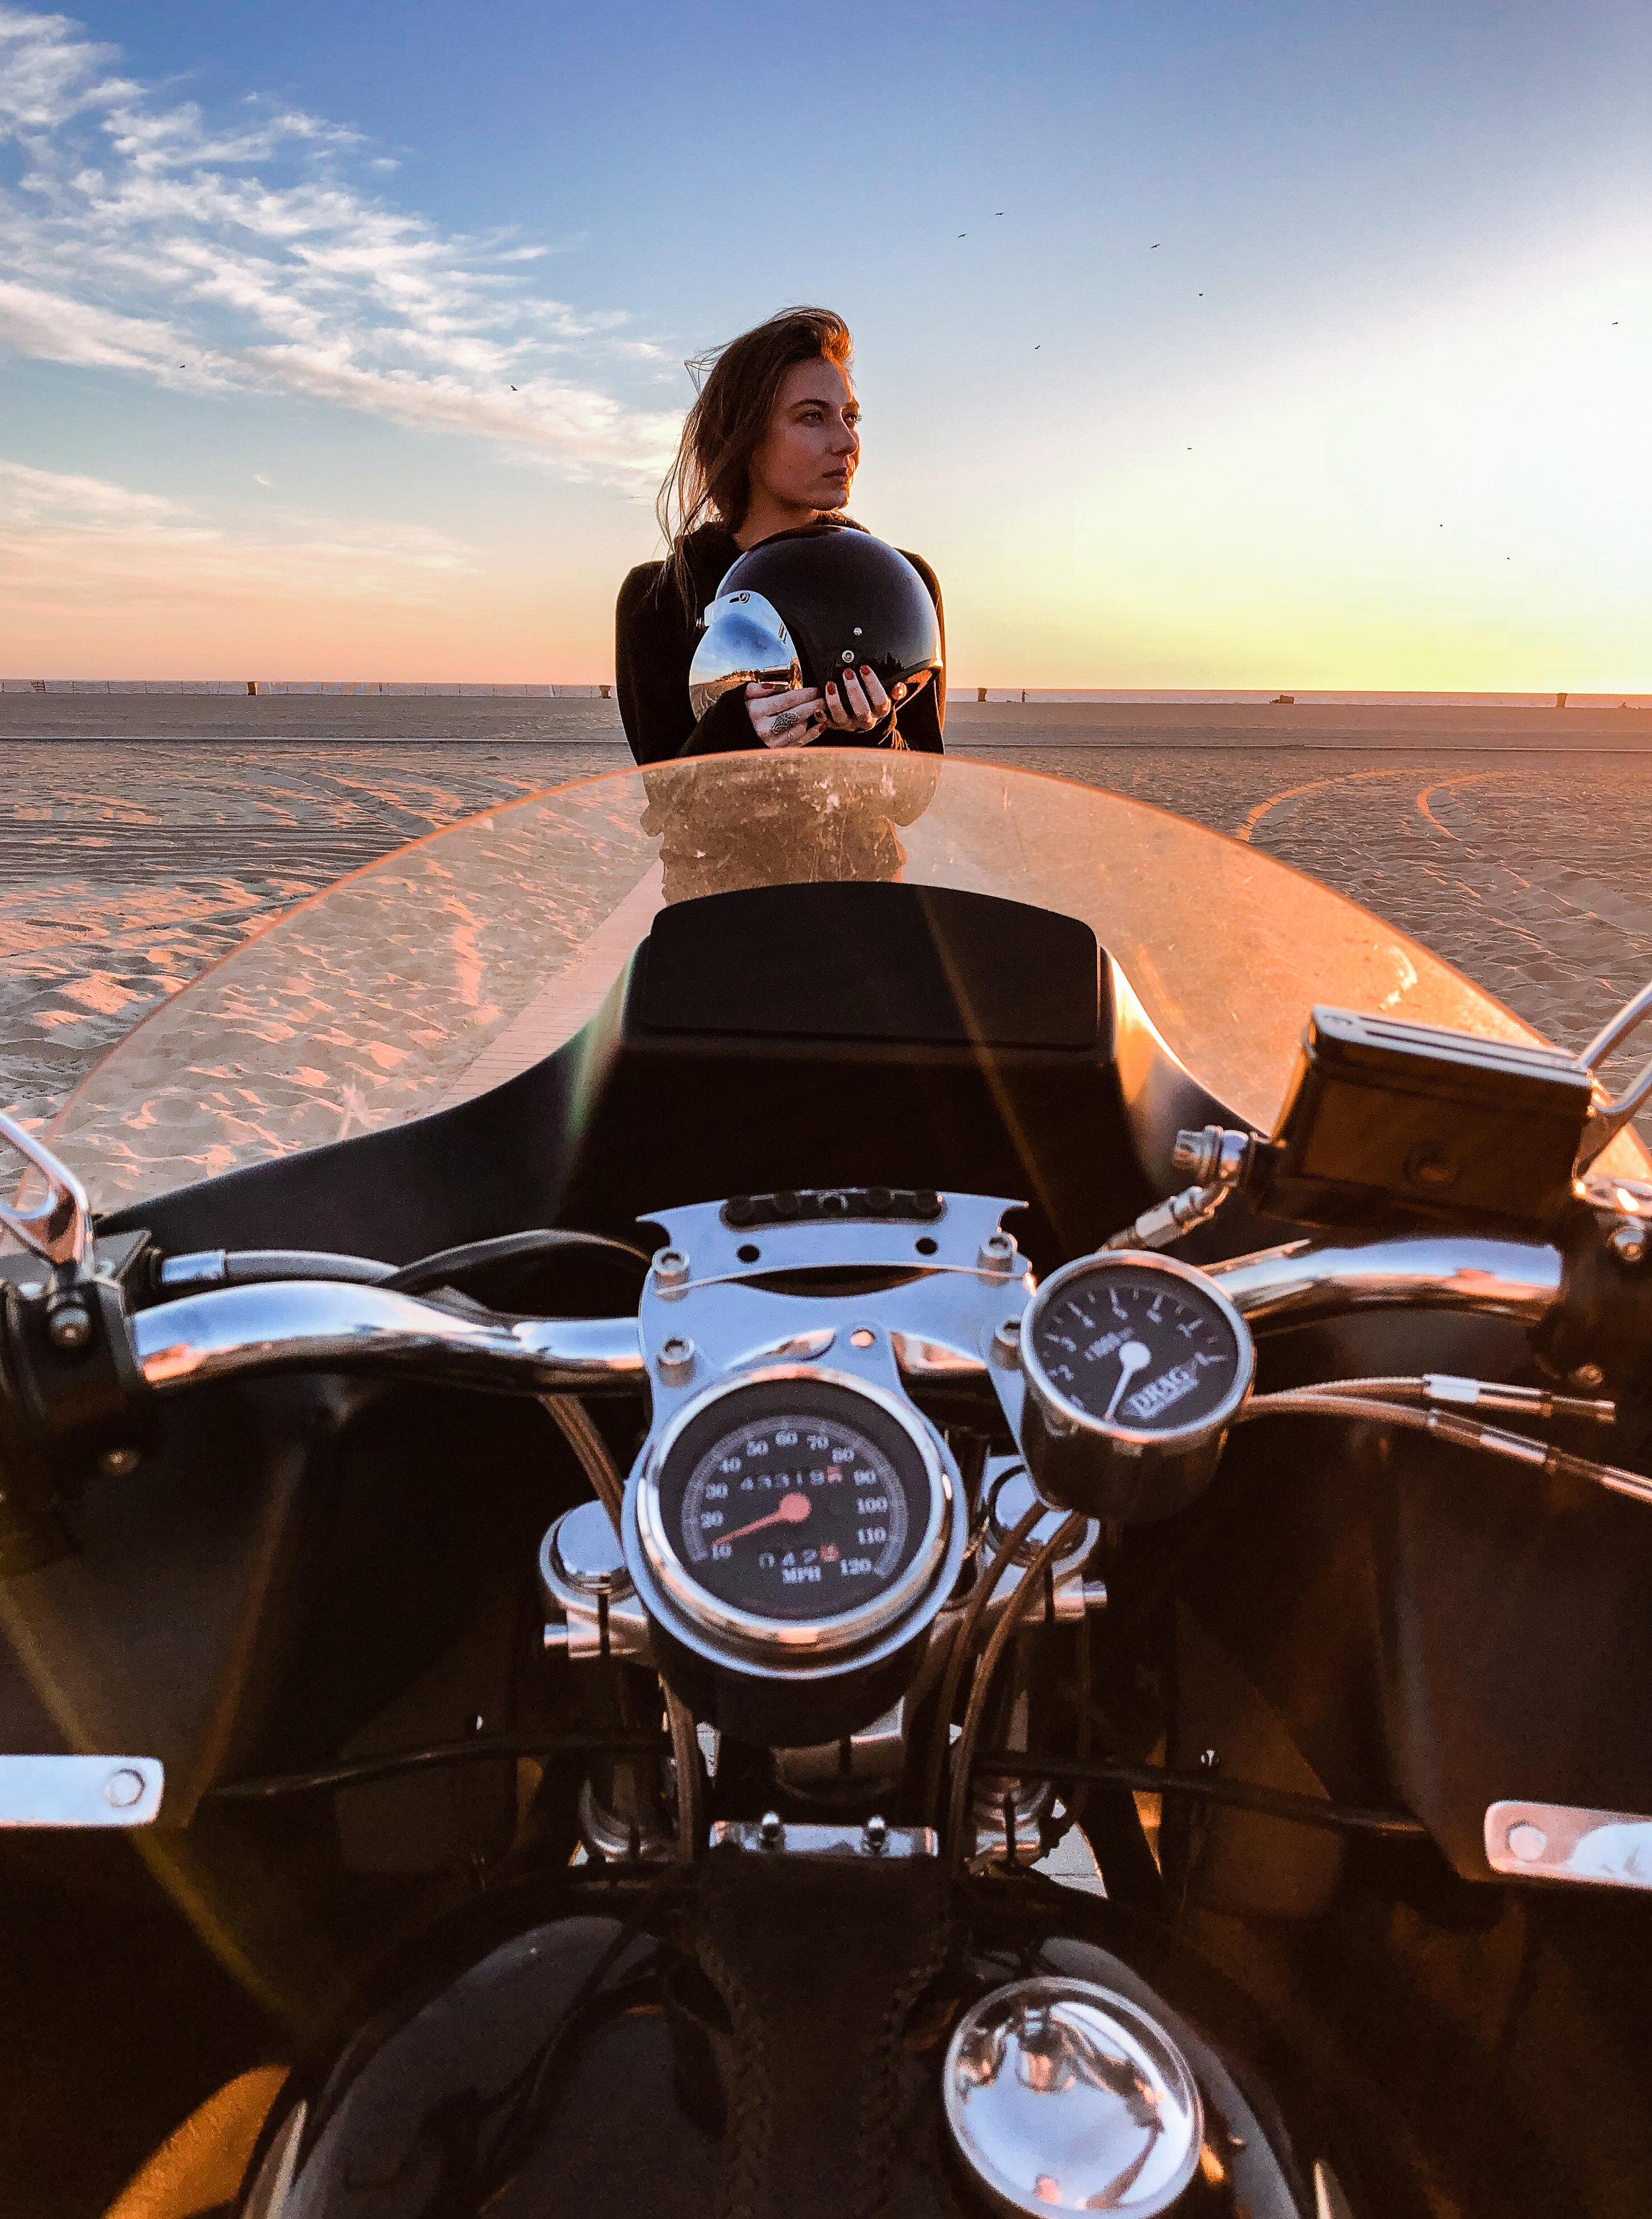 Brave motorcycle girl-1.jpg